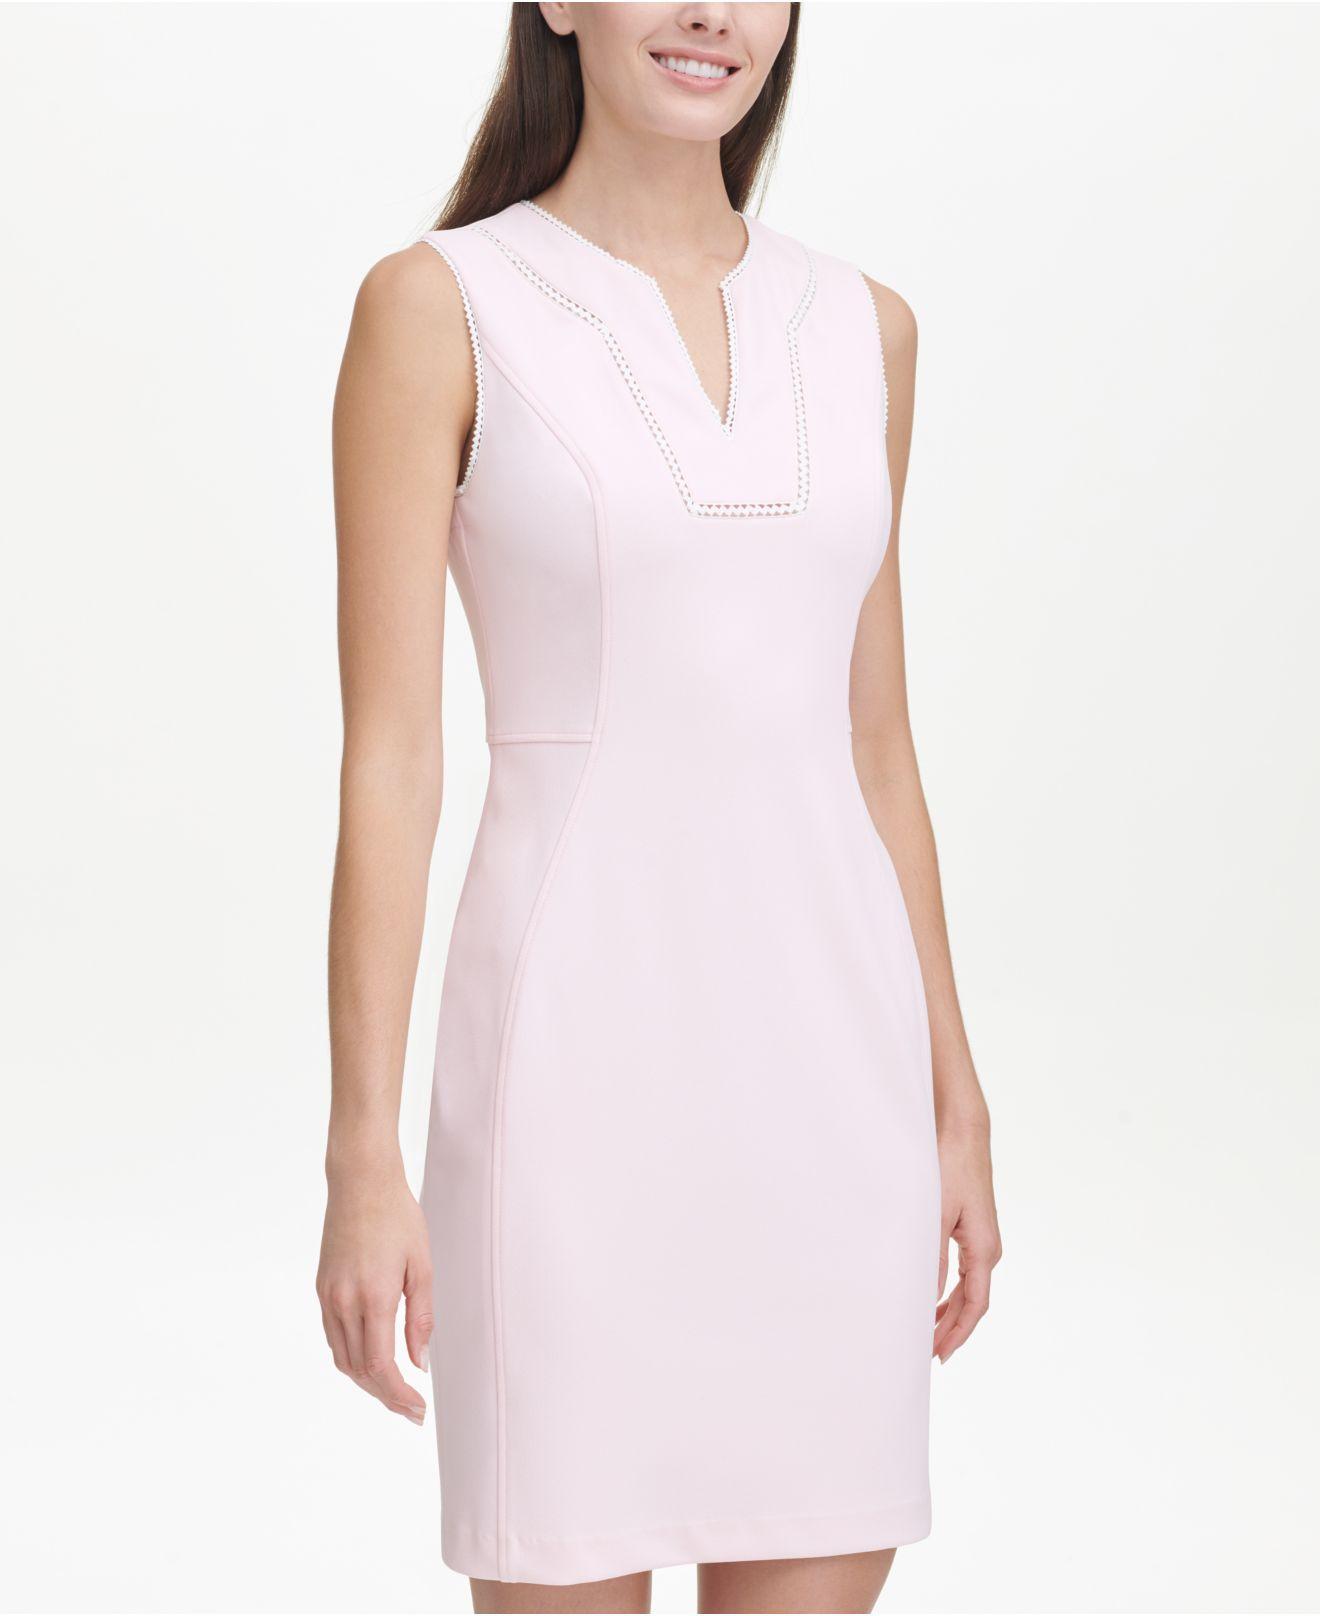 b6762e3cbc8 Lyst - Tommy Hilfiger Scuba Crepe Sheath Dress in Pink